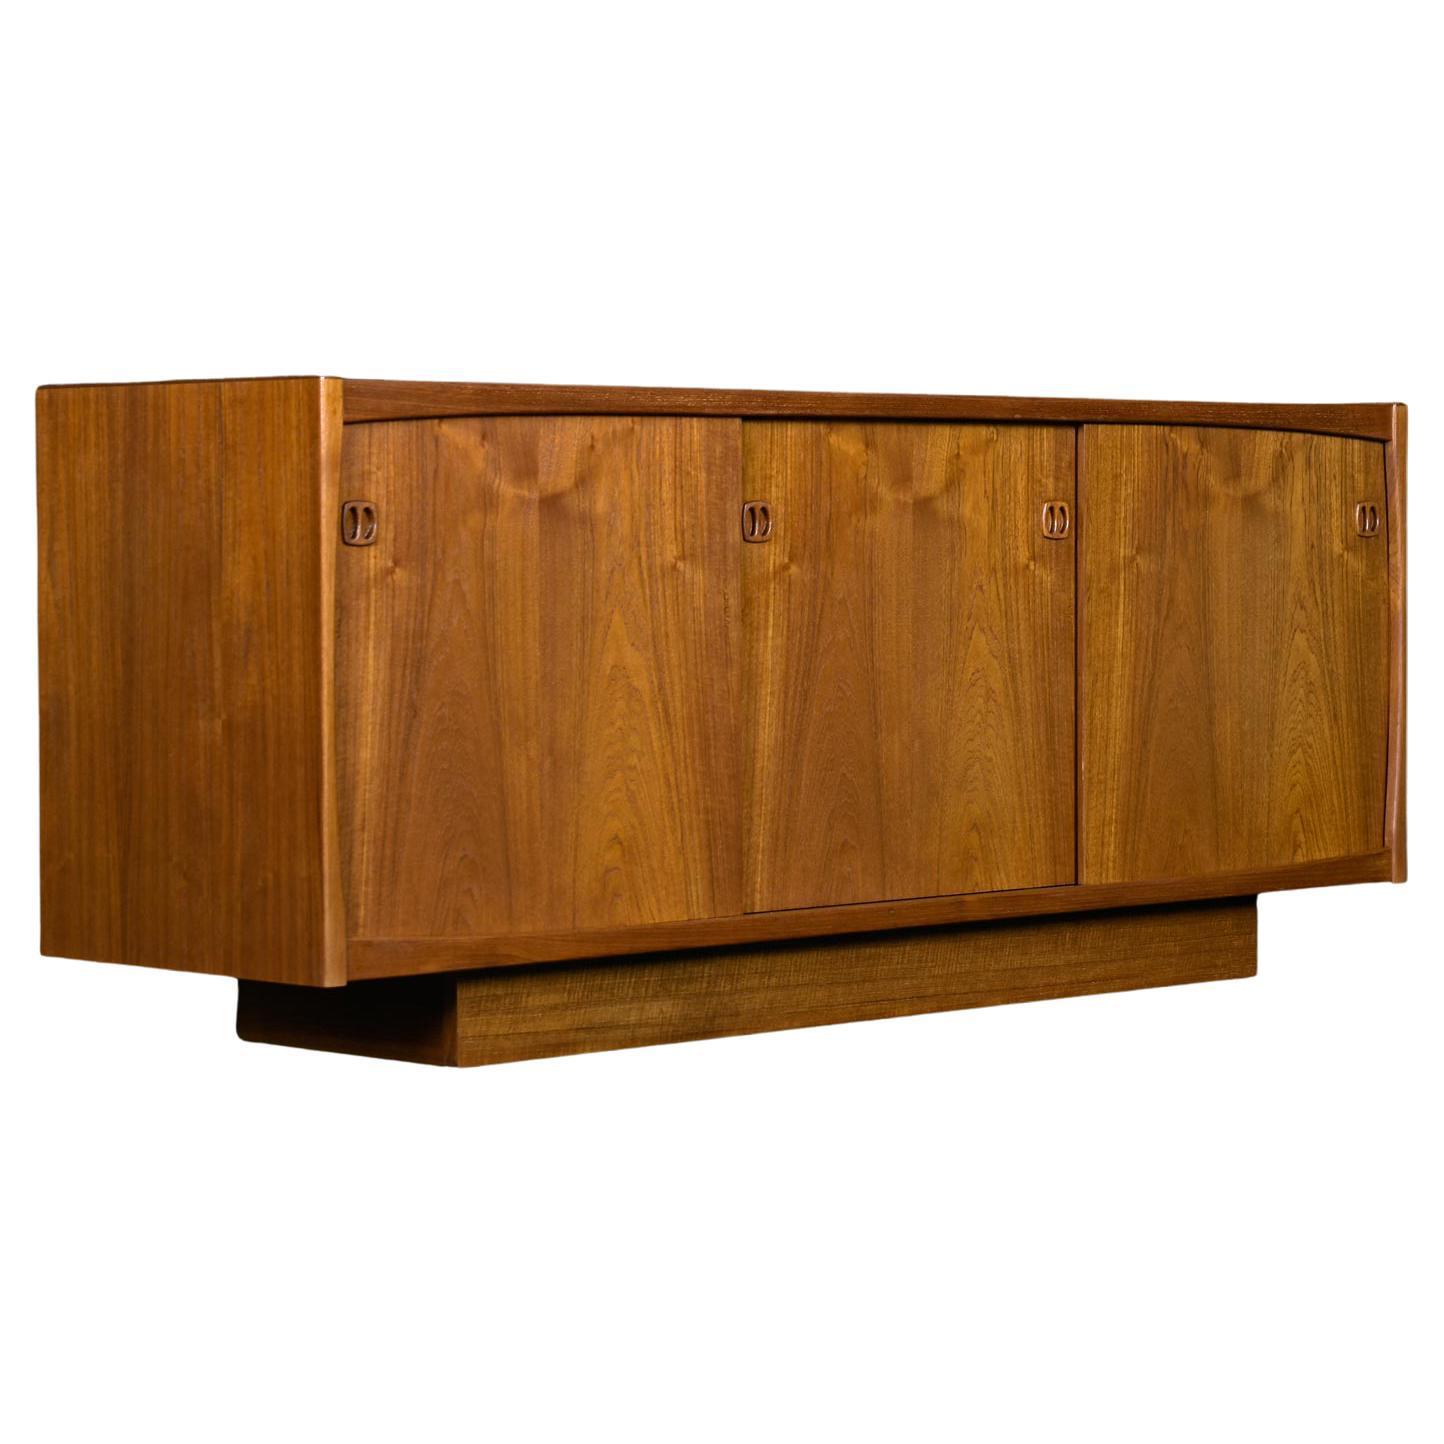 Danish Modern Teak Sliding Door Credenza Media Cabinet by Laurits M Larsen